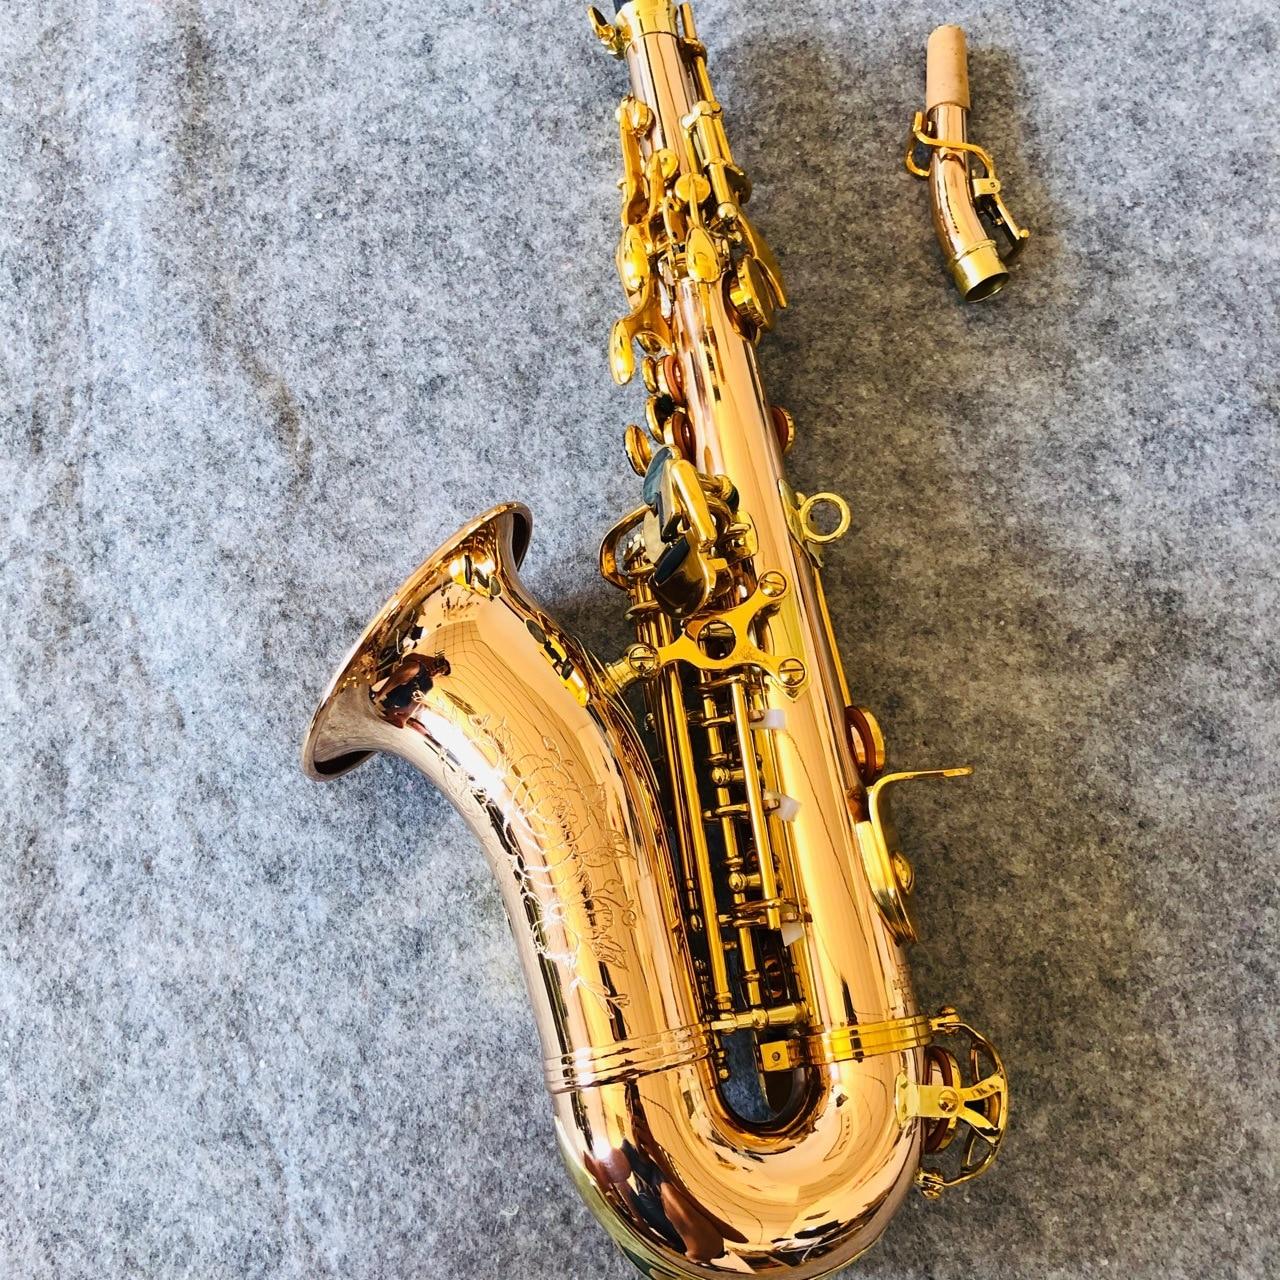 de bronze concha snap grelhado saxofone primavera azul